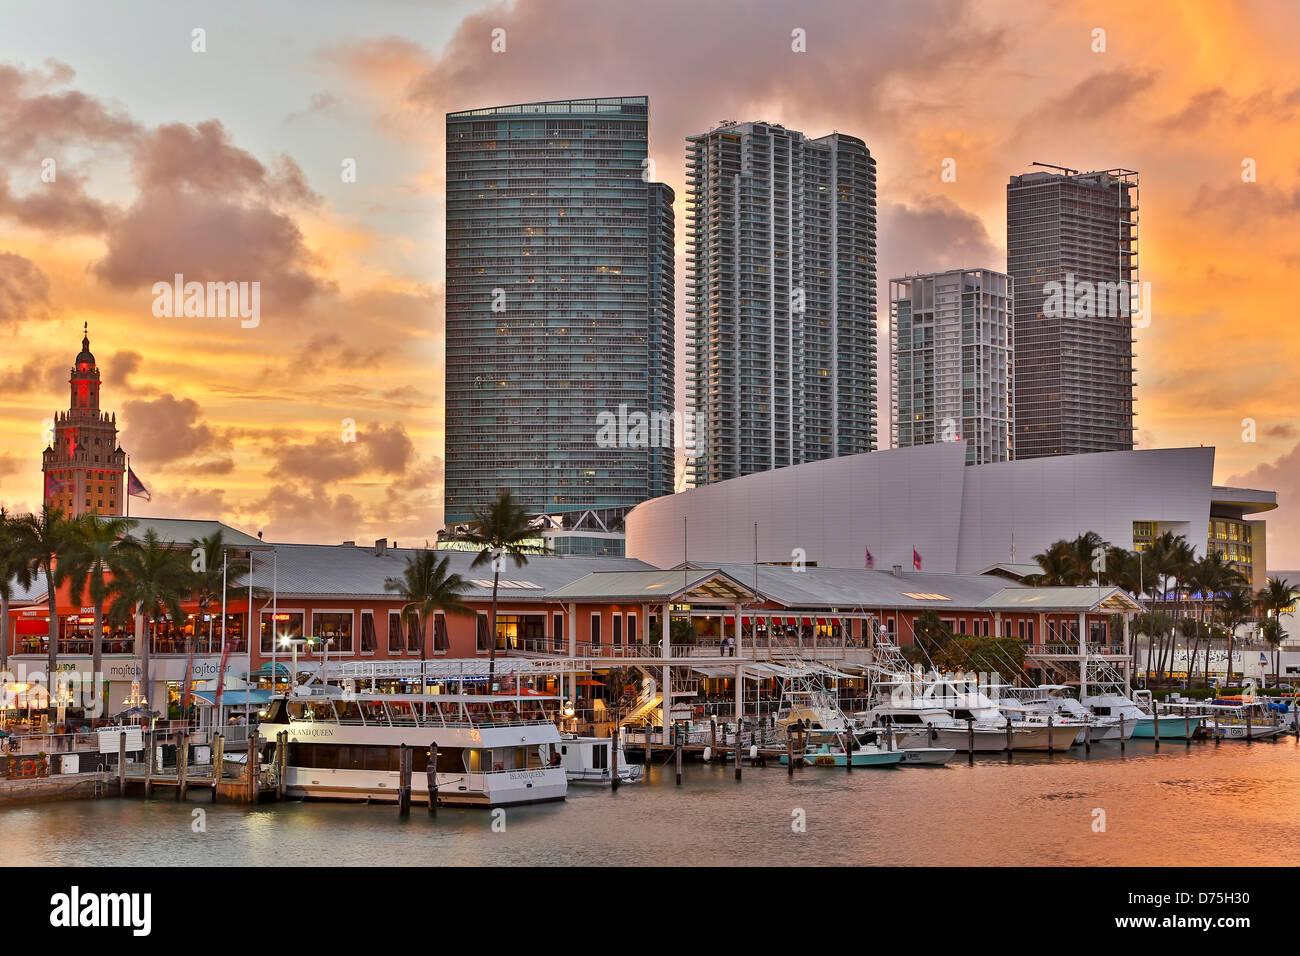 Marina a bayfront marketplace e grattacieli, Miami, Florida USA Immagini Stock